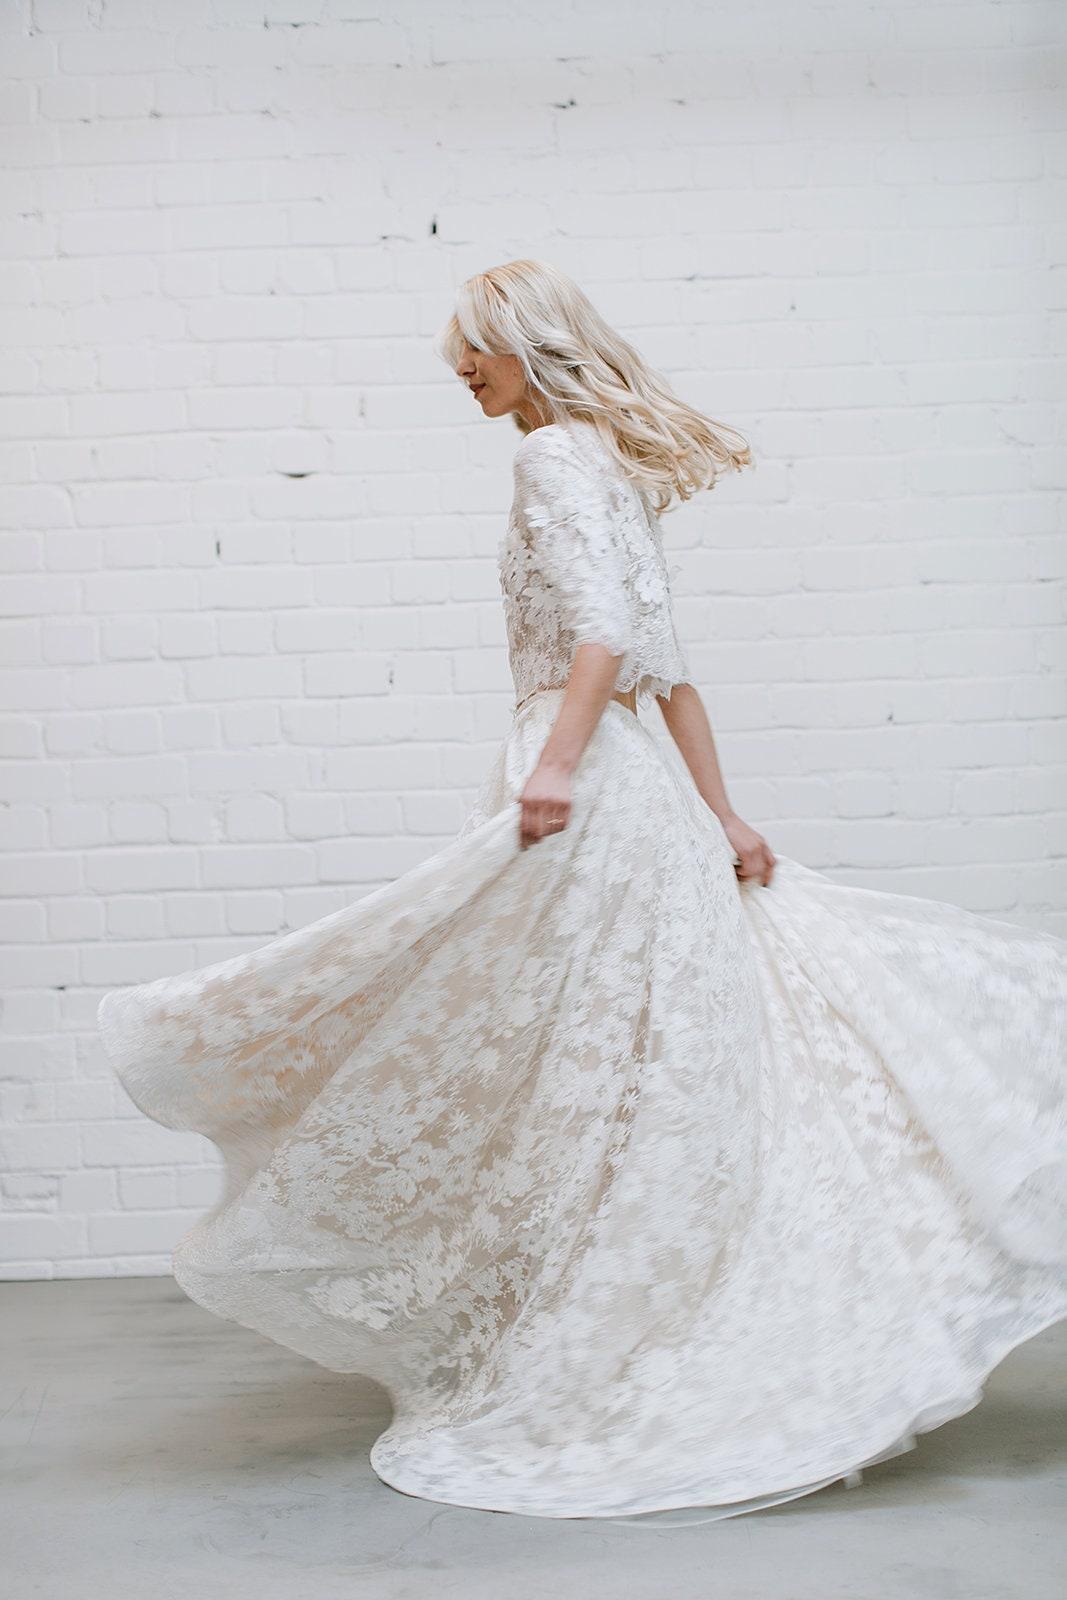 0a5568604f Lace Wedding Dress High Low Dress Two Piece Wedding Dress | Etsy